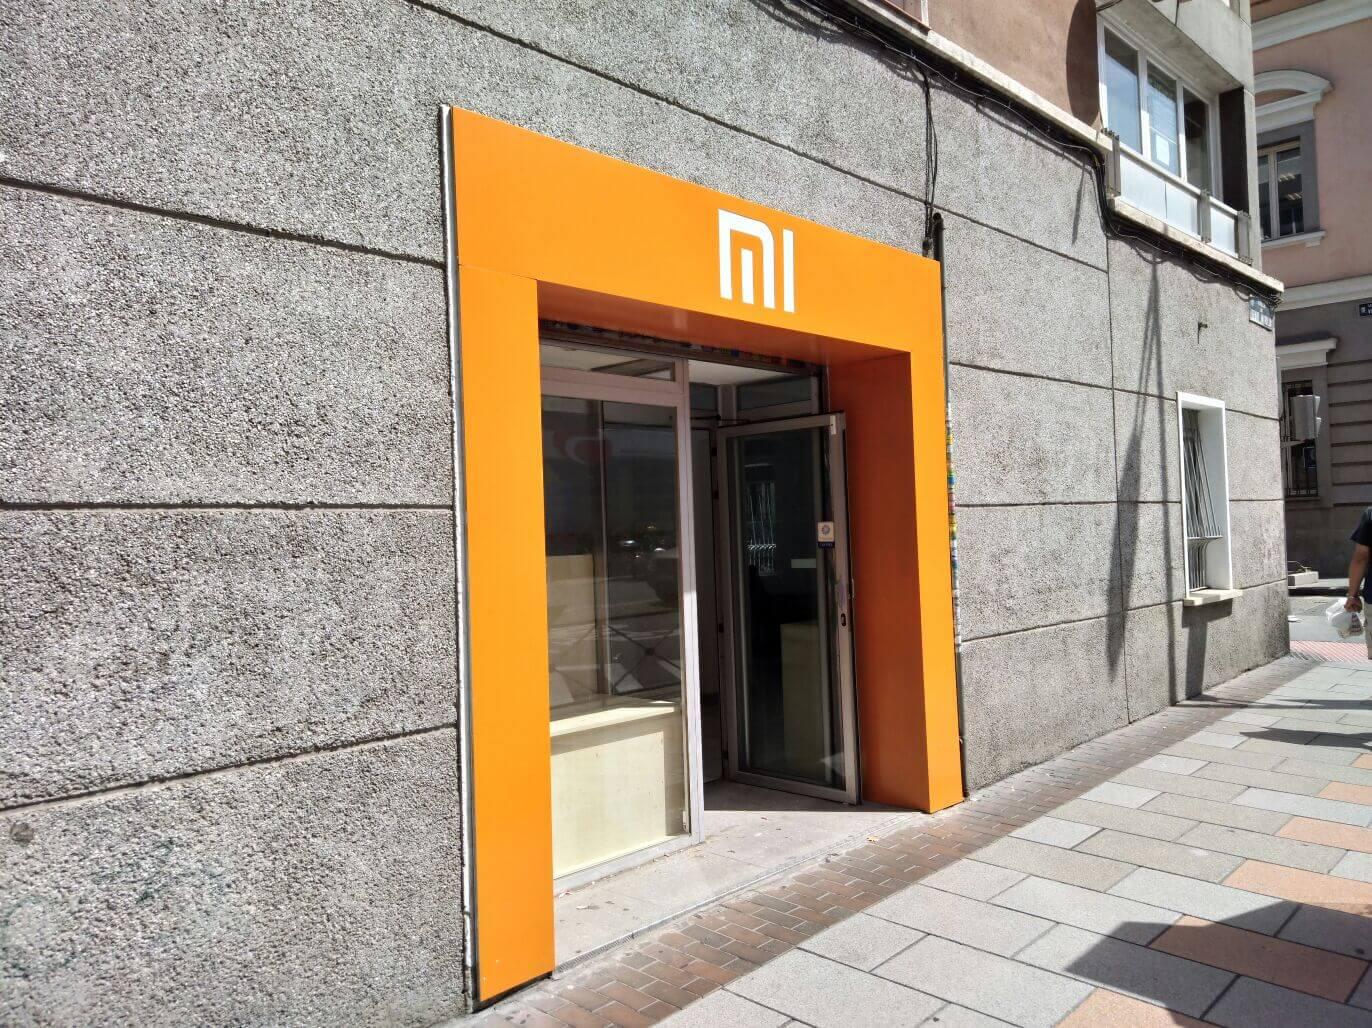 Tienda Xiaomi by Vayava